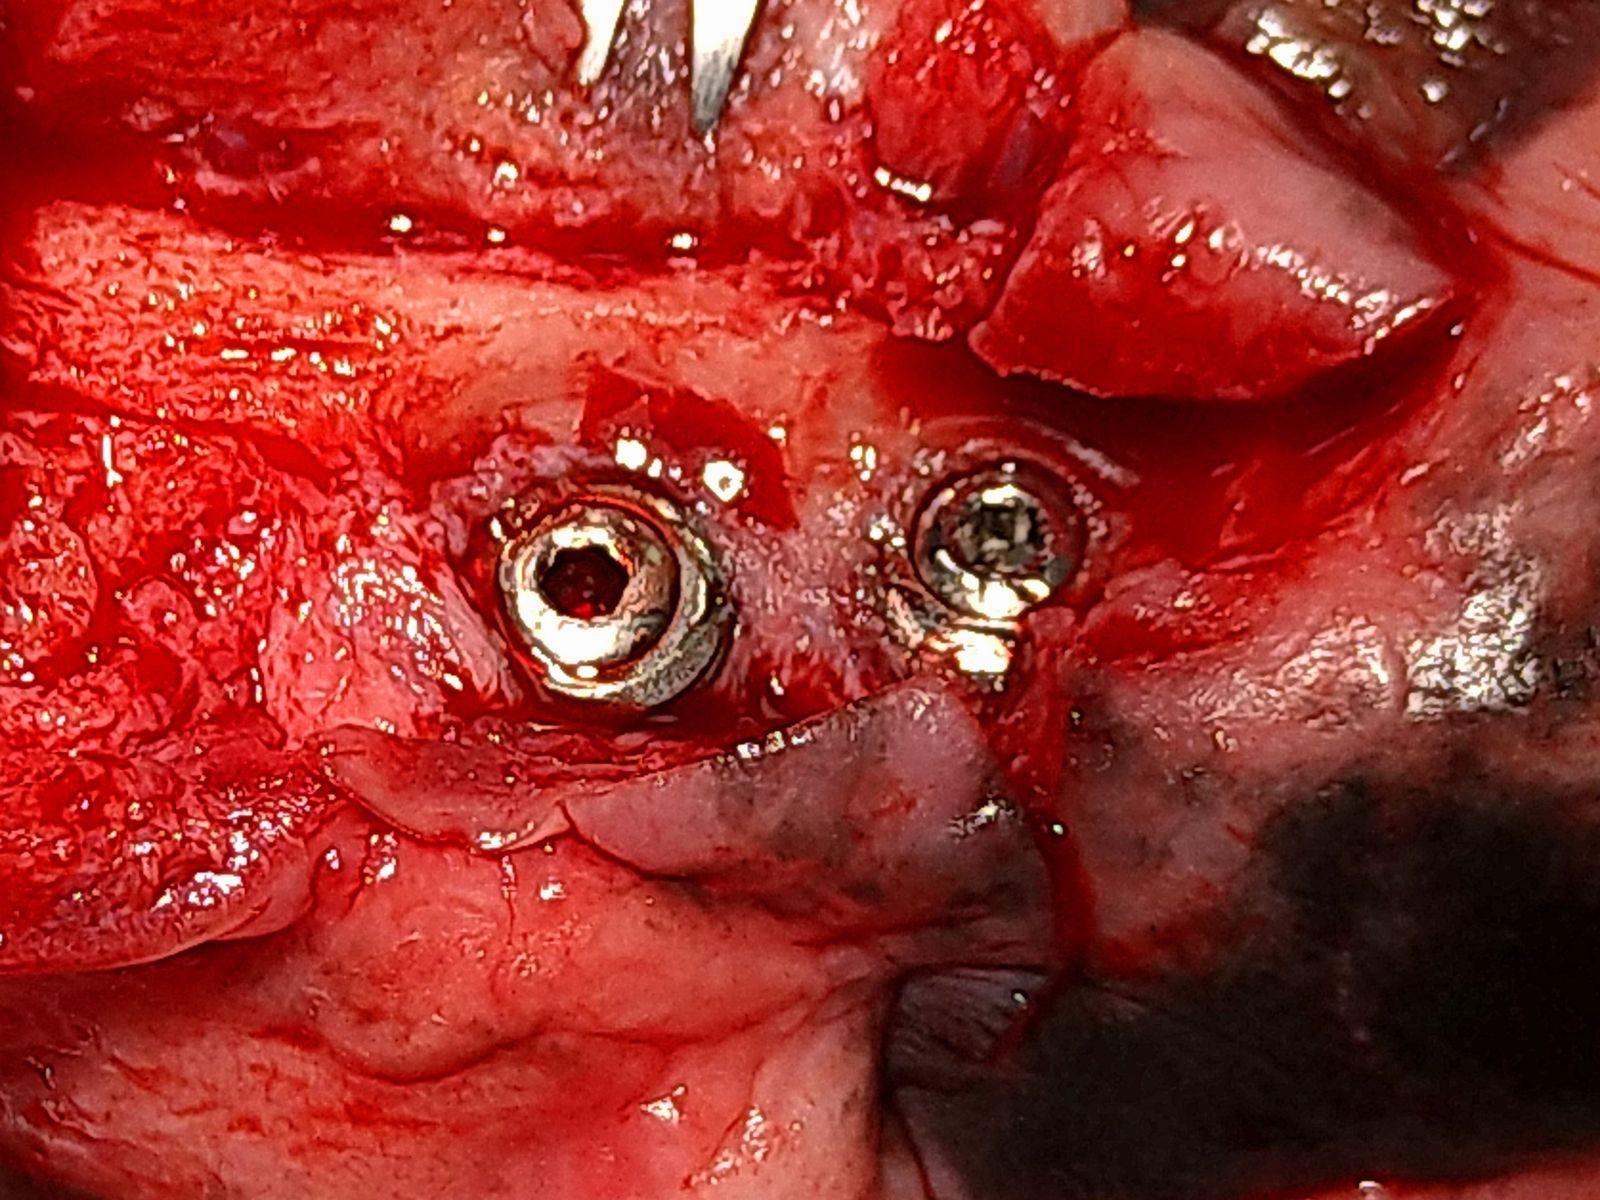 3 mois post implant